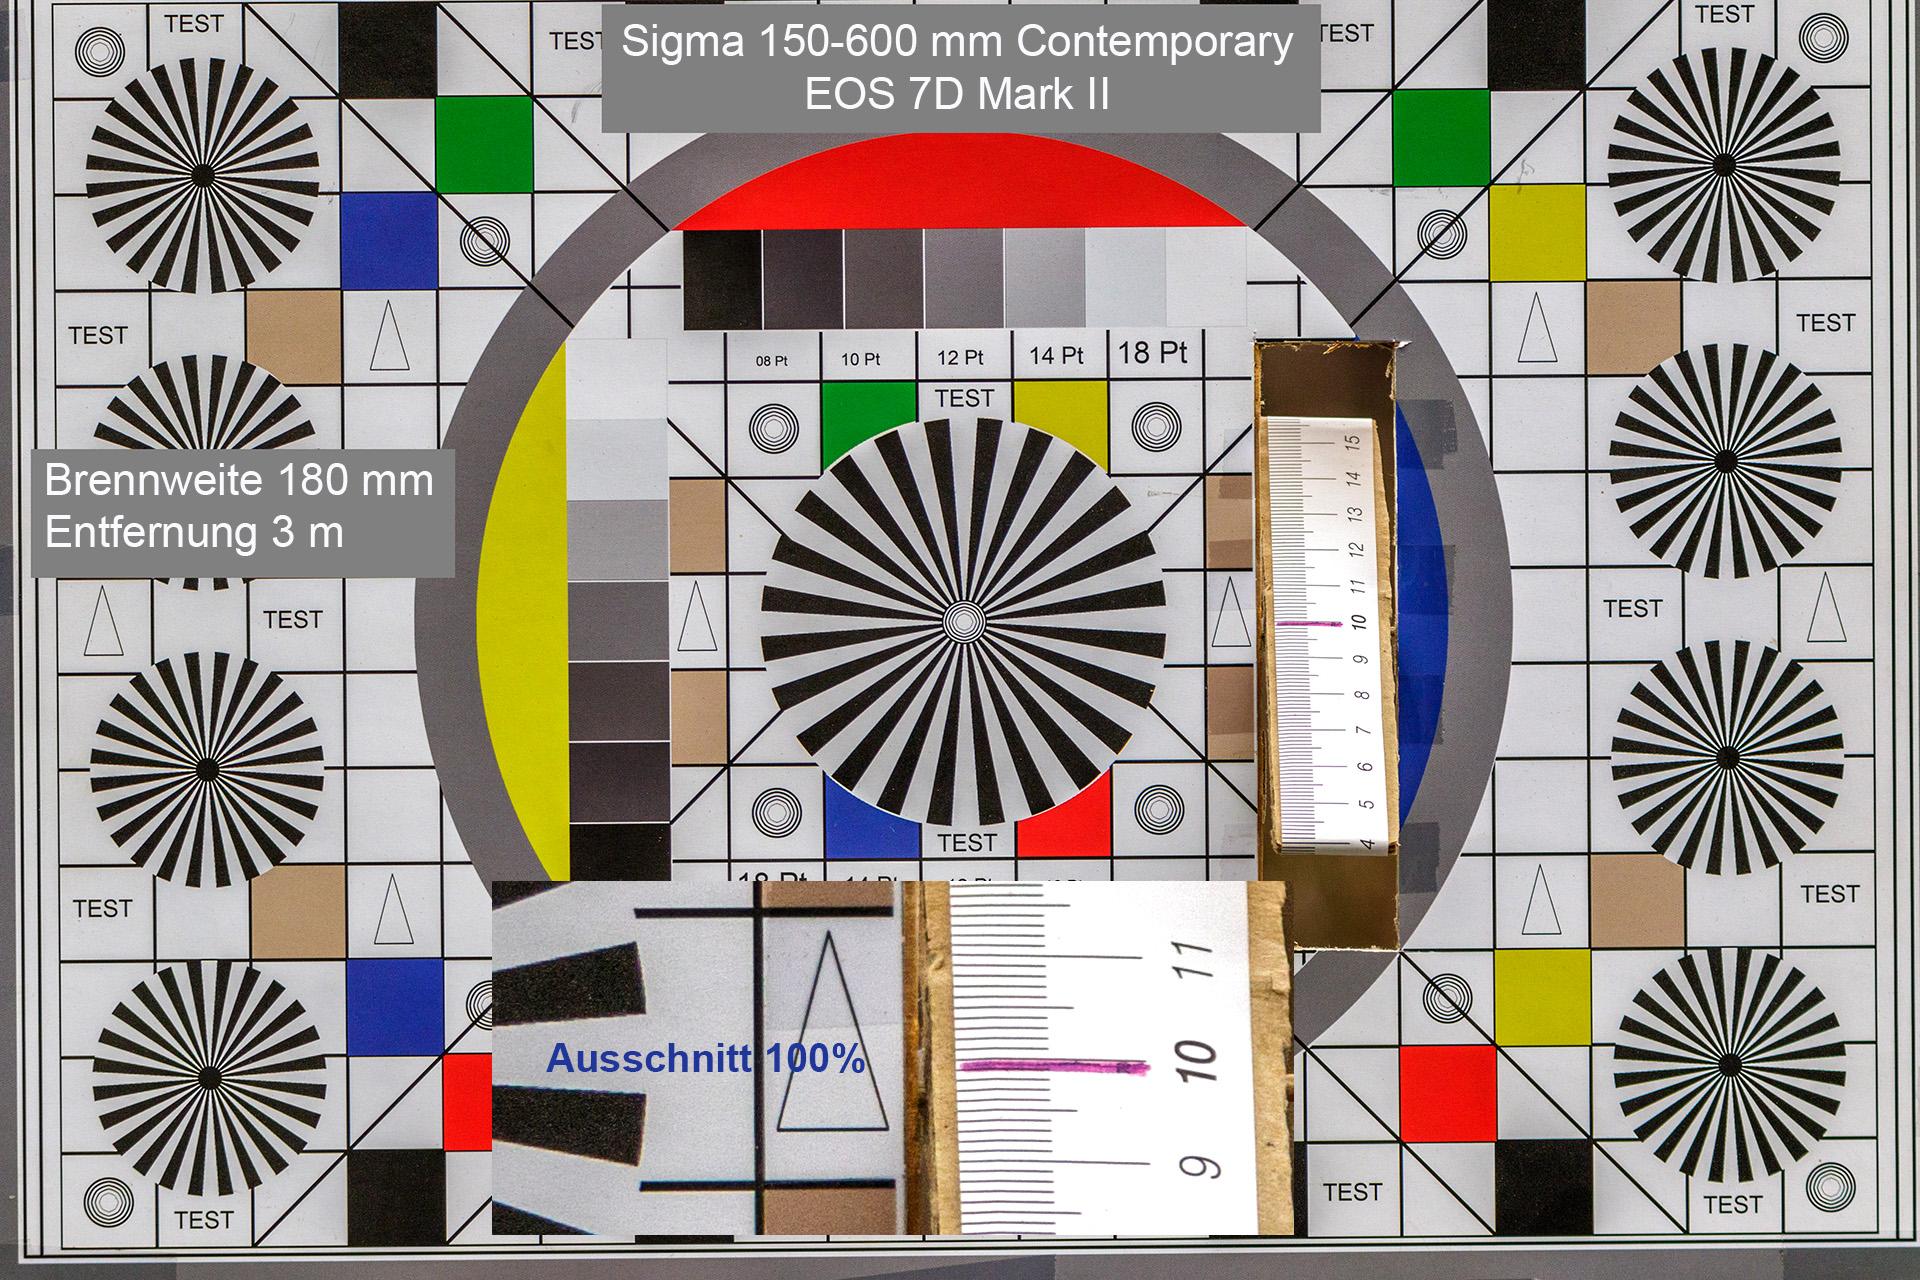 Testaufnahmen, Sigma 150-600 mm, 7D Mark II, 3 Meter, 180 mm